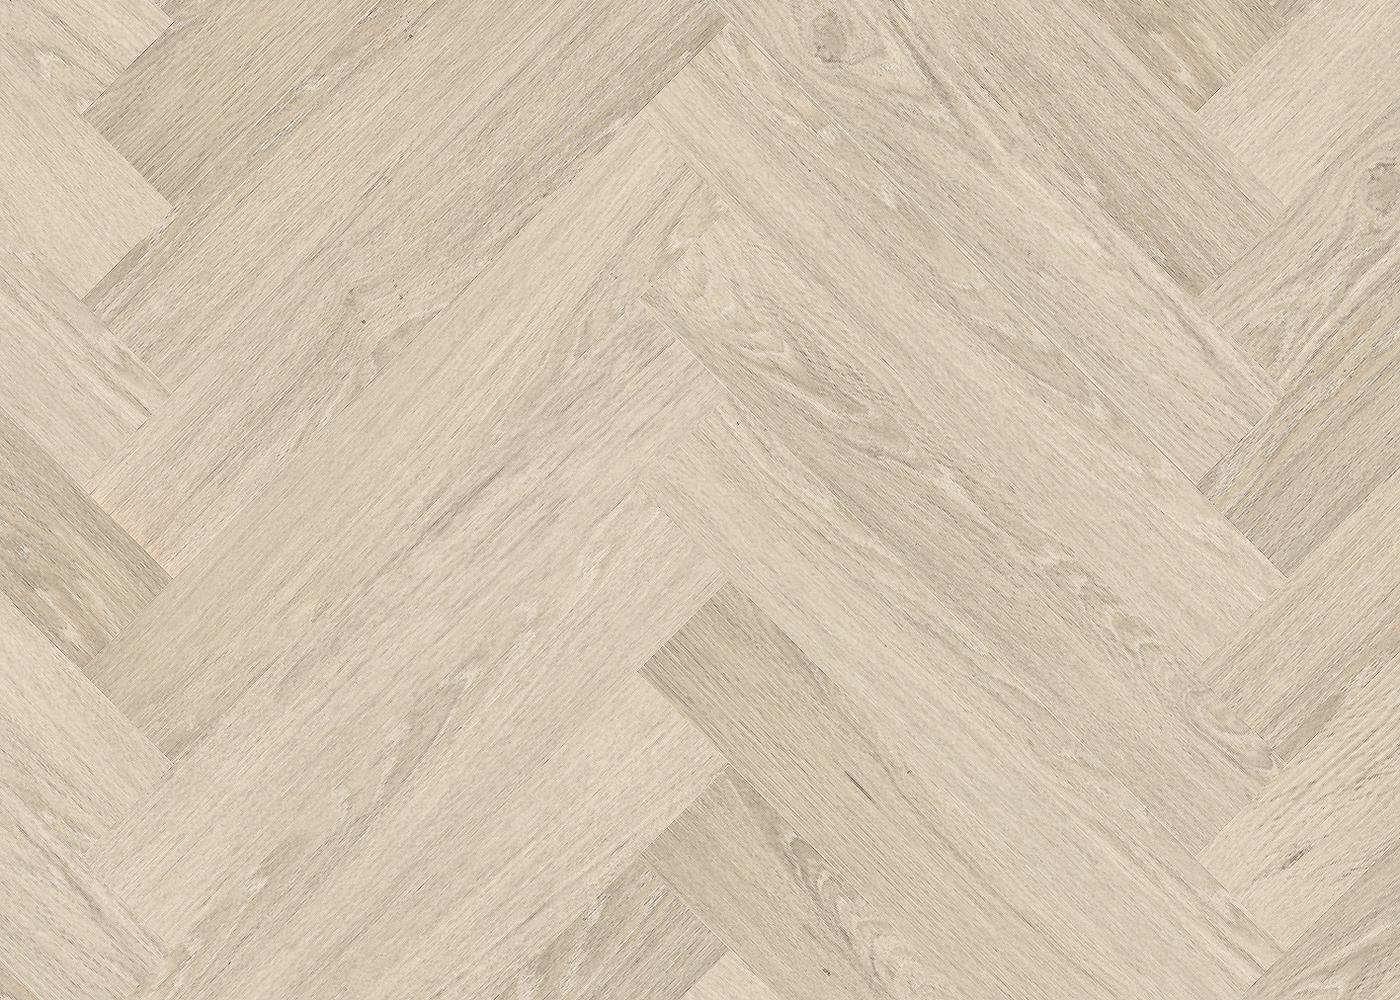 Vinyle rigide Chêne Ika Bâton rompu passage commercial 4.5x125x750